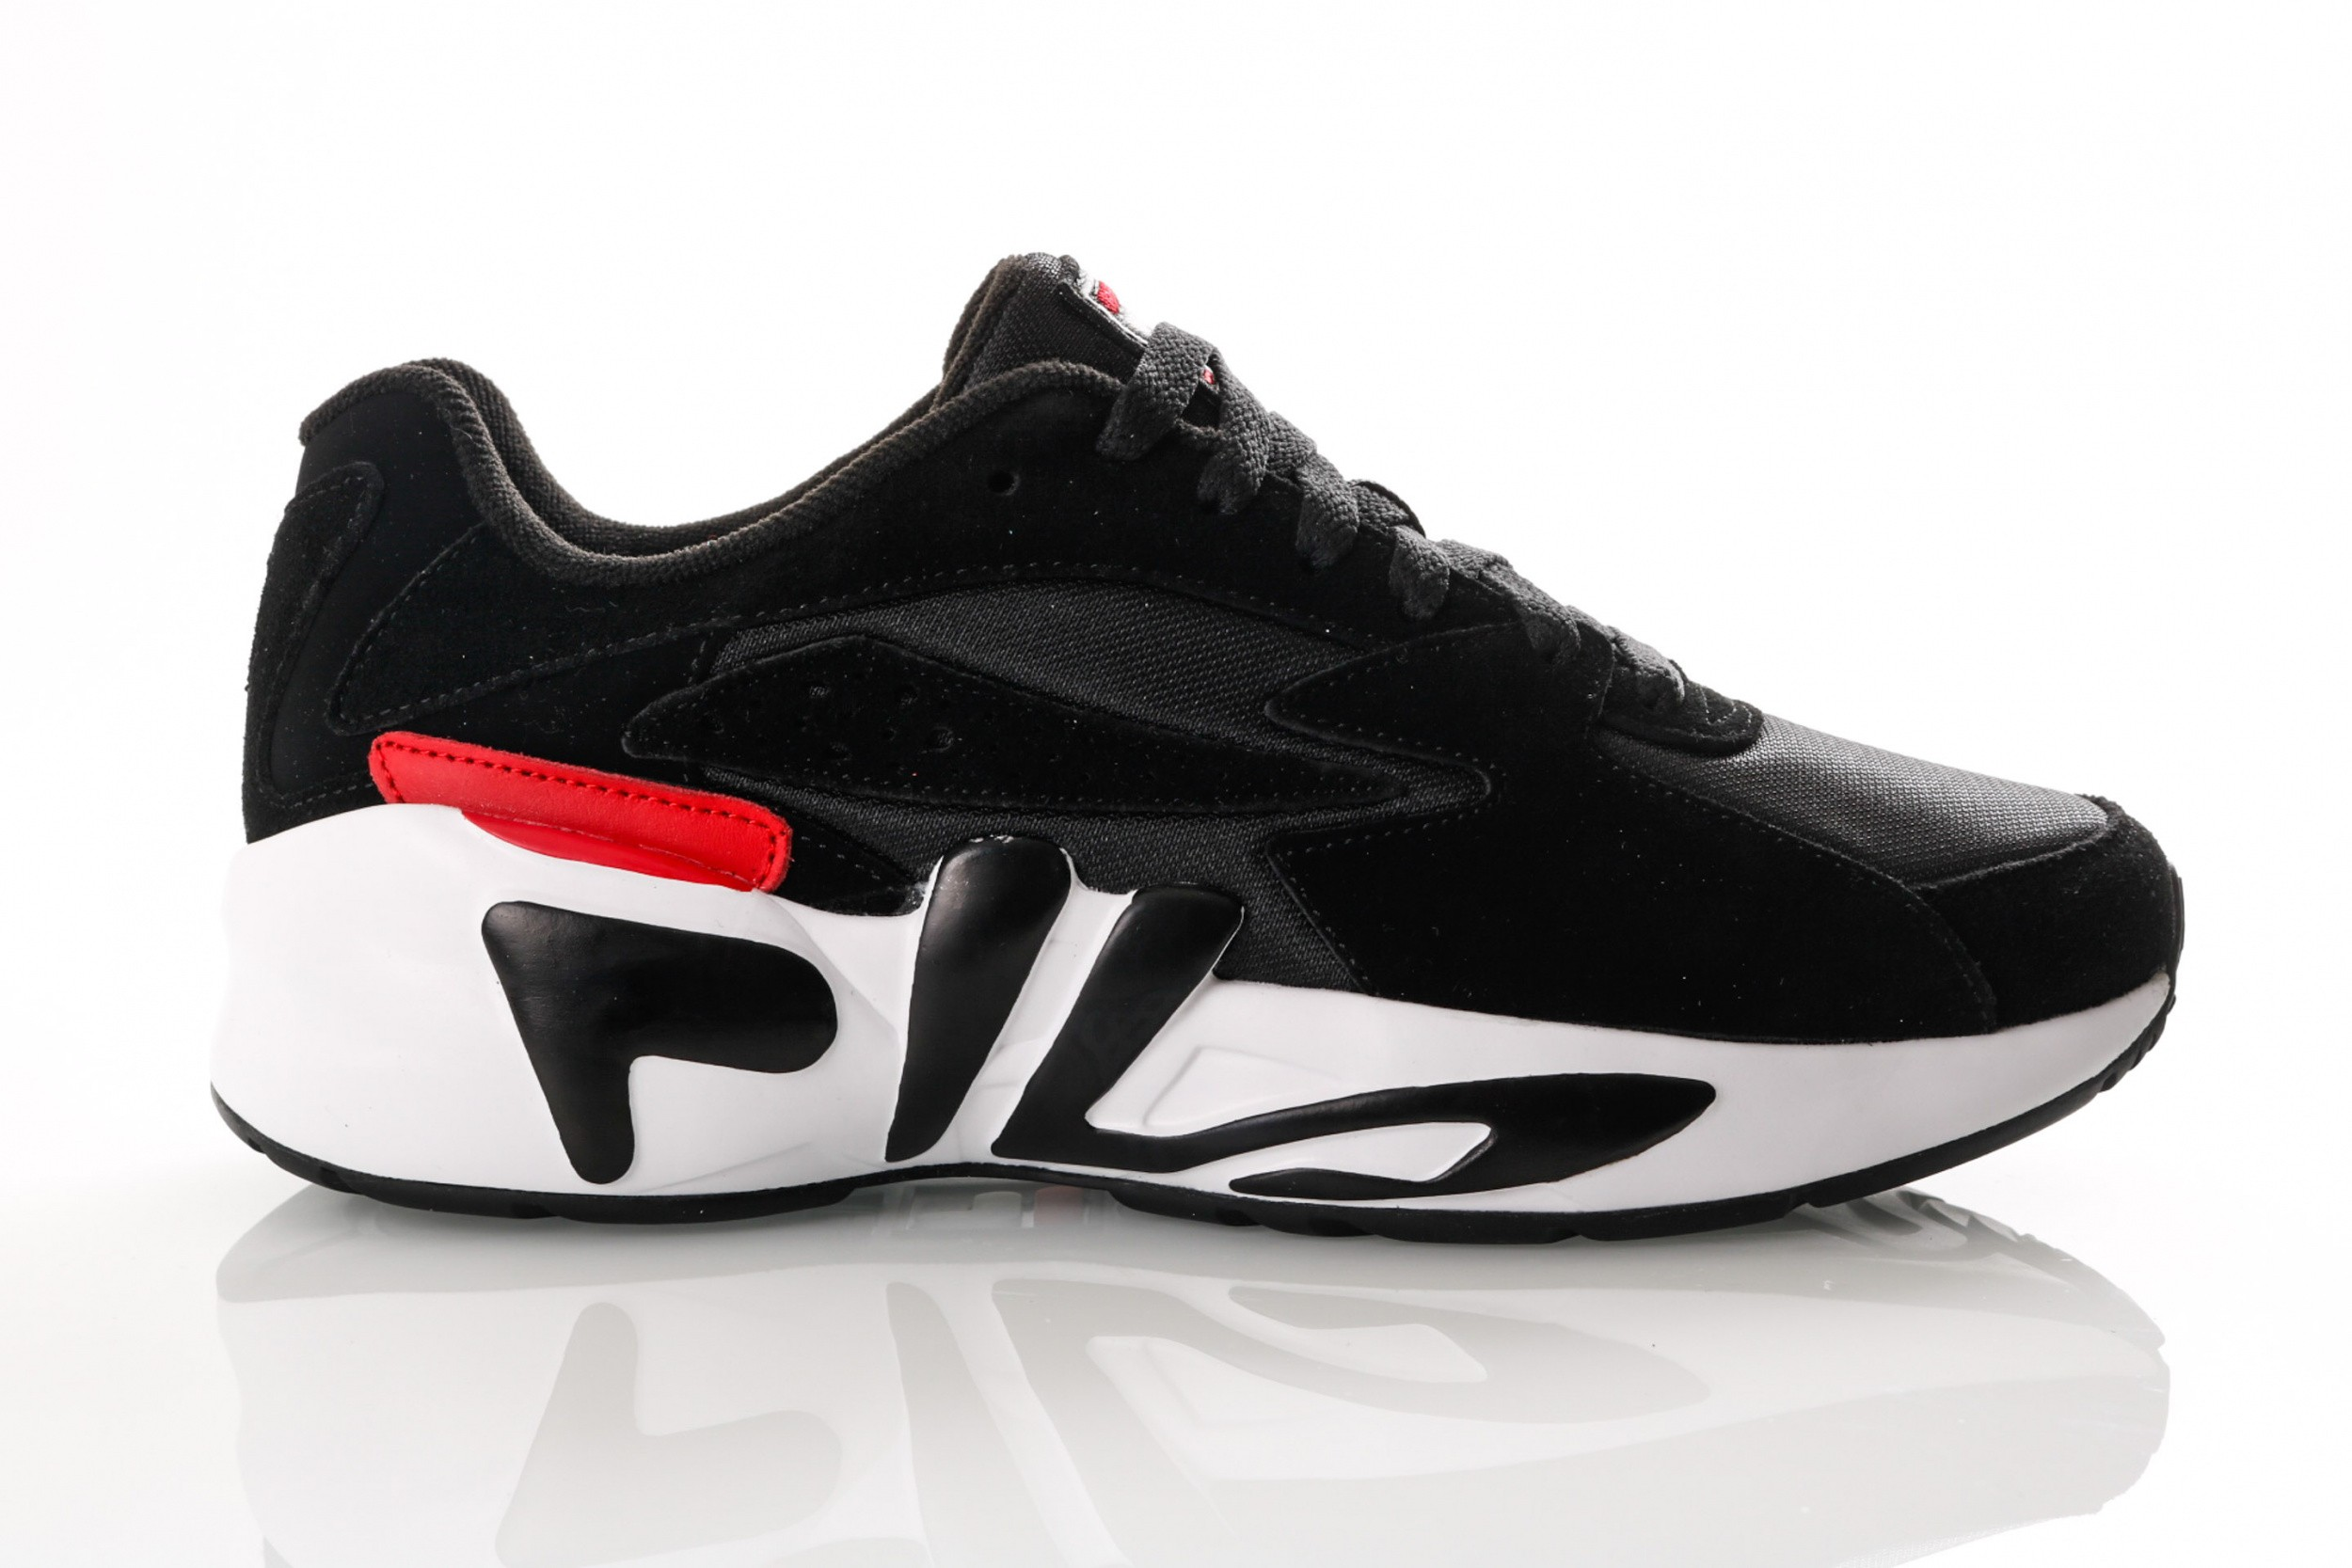 Foto van Fila Mindblower 1010574 Sneakers Black/White/Fila Red